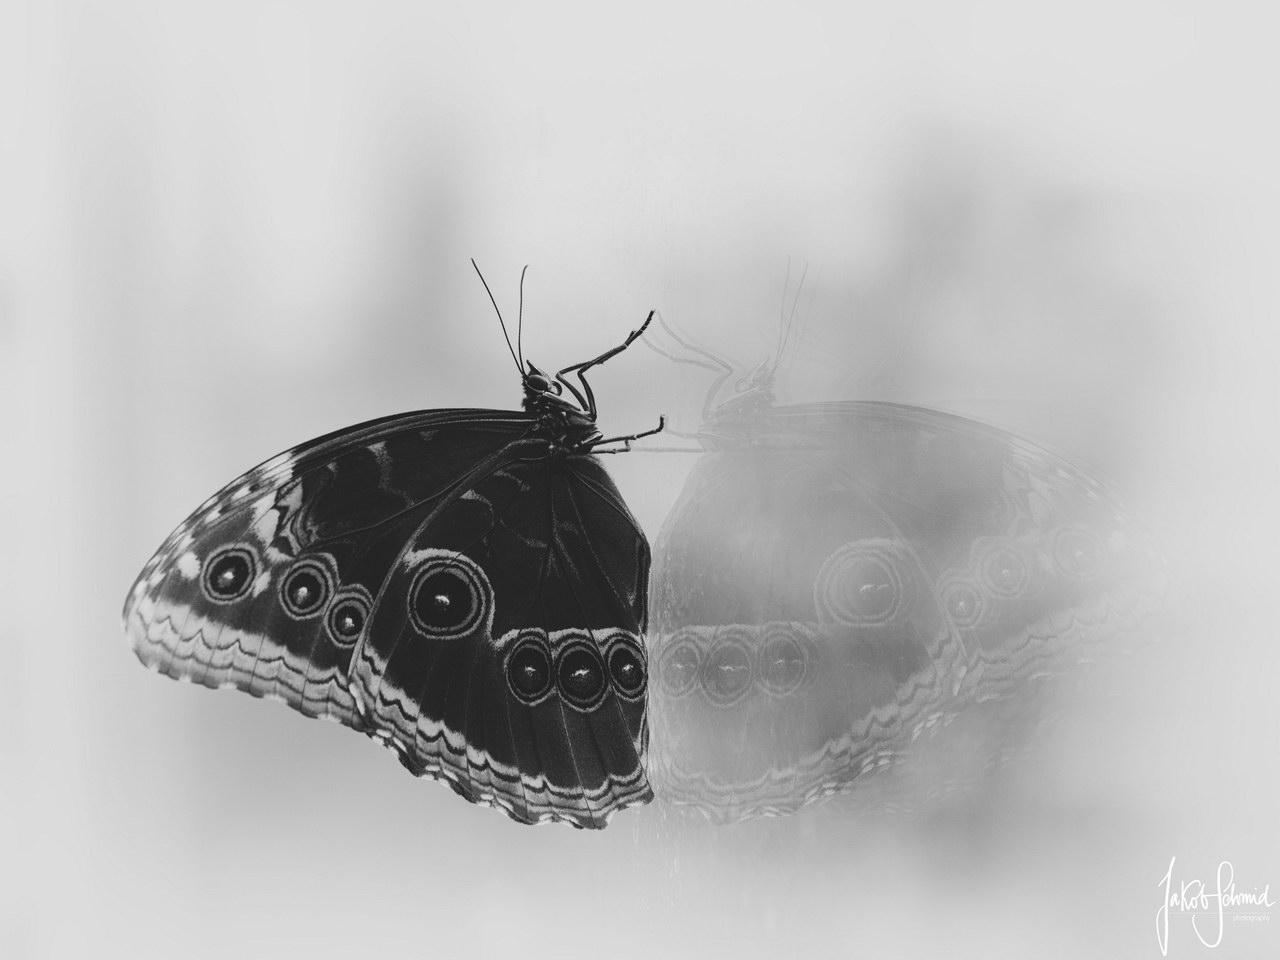 Makro Bananenfalter Schmetterling